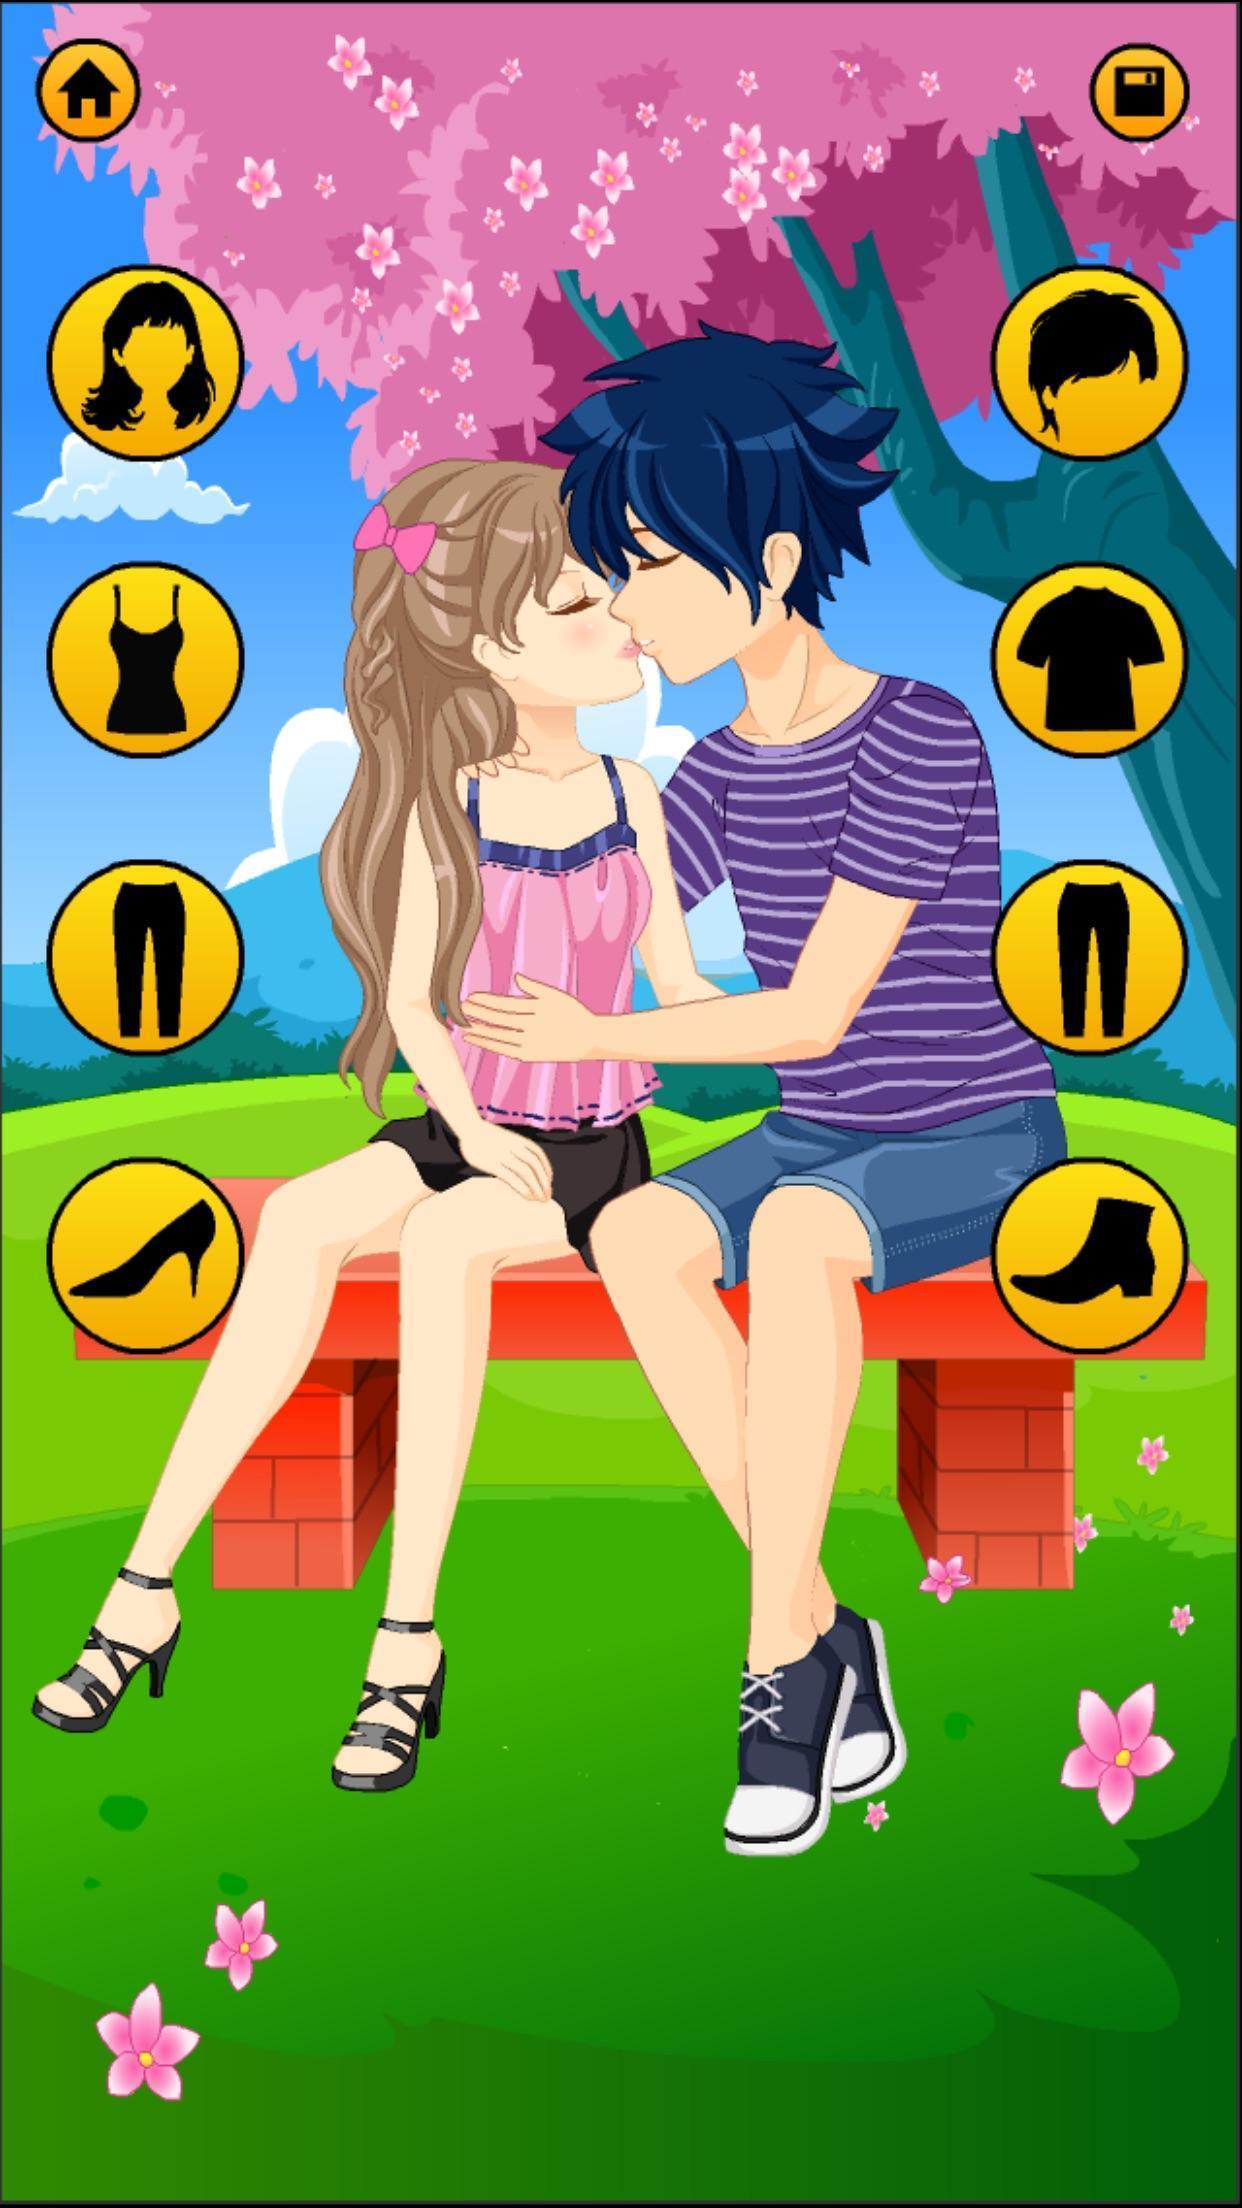 Anime Dress Up Games For Girls - Couple Love Kiss 3.3 Screenshot 5